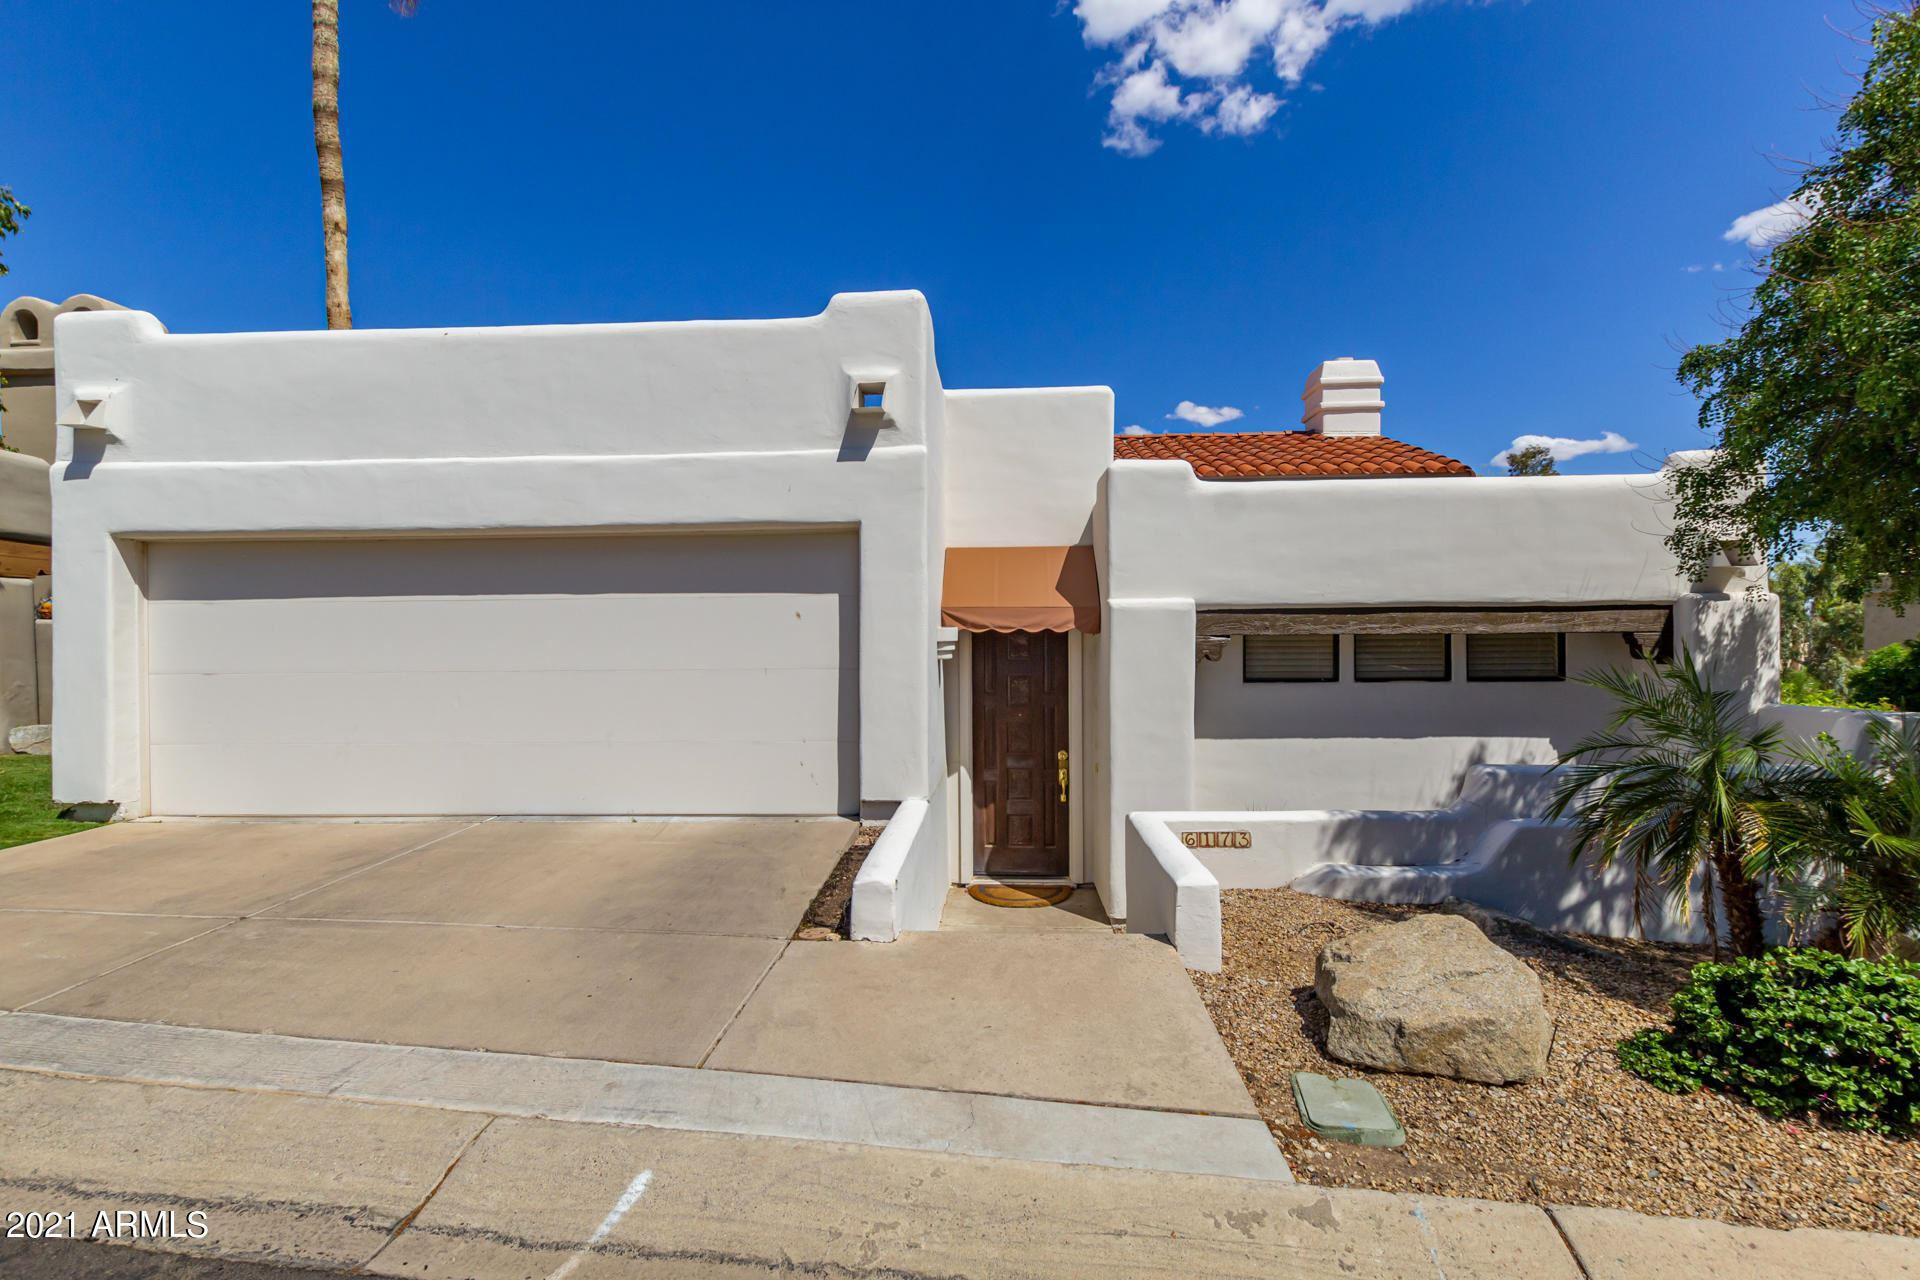 6173 N 28TH Place, Phoenix, AZ 85016 - MLS#: 6228303